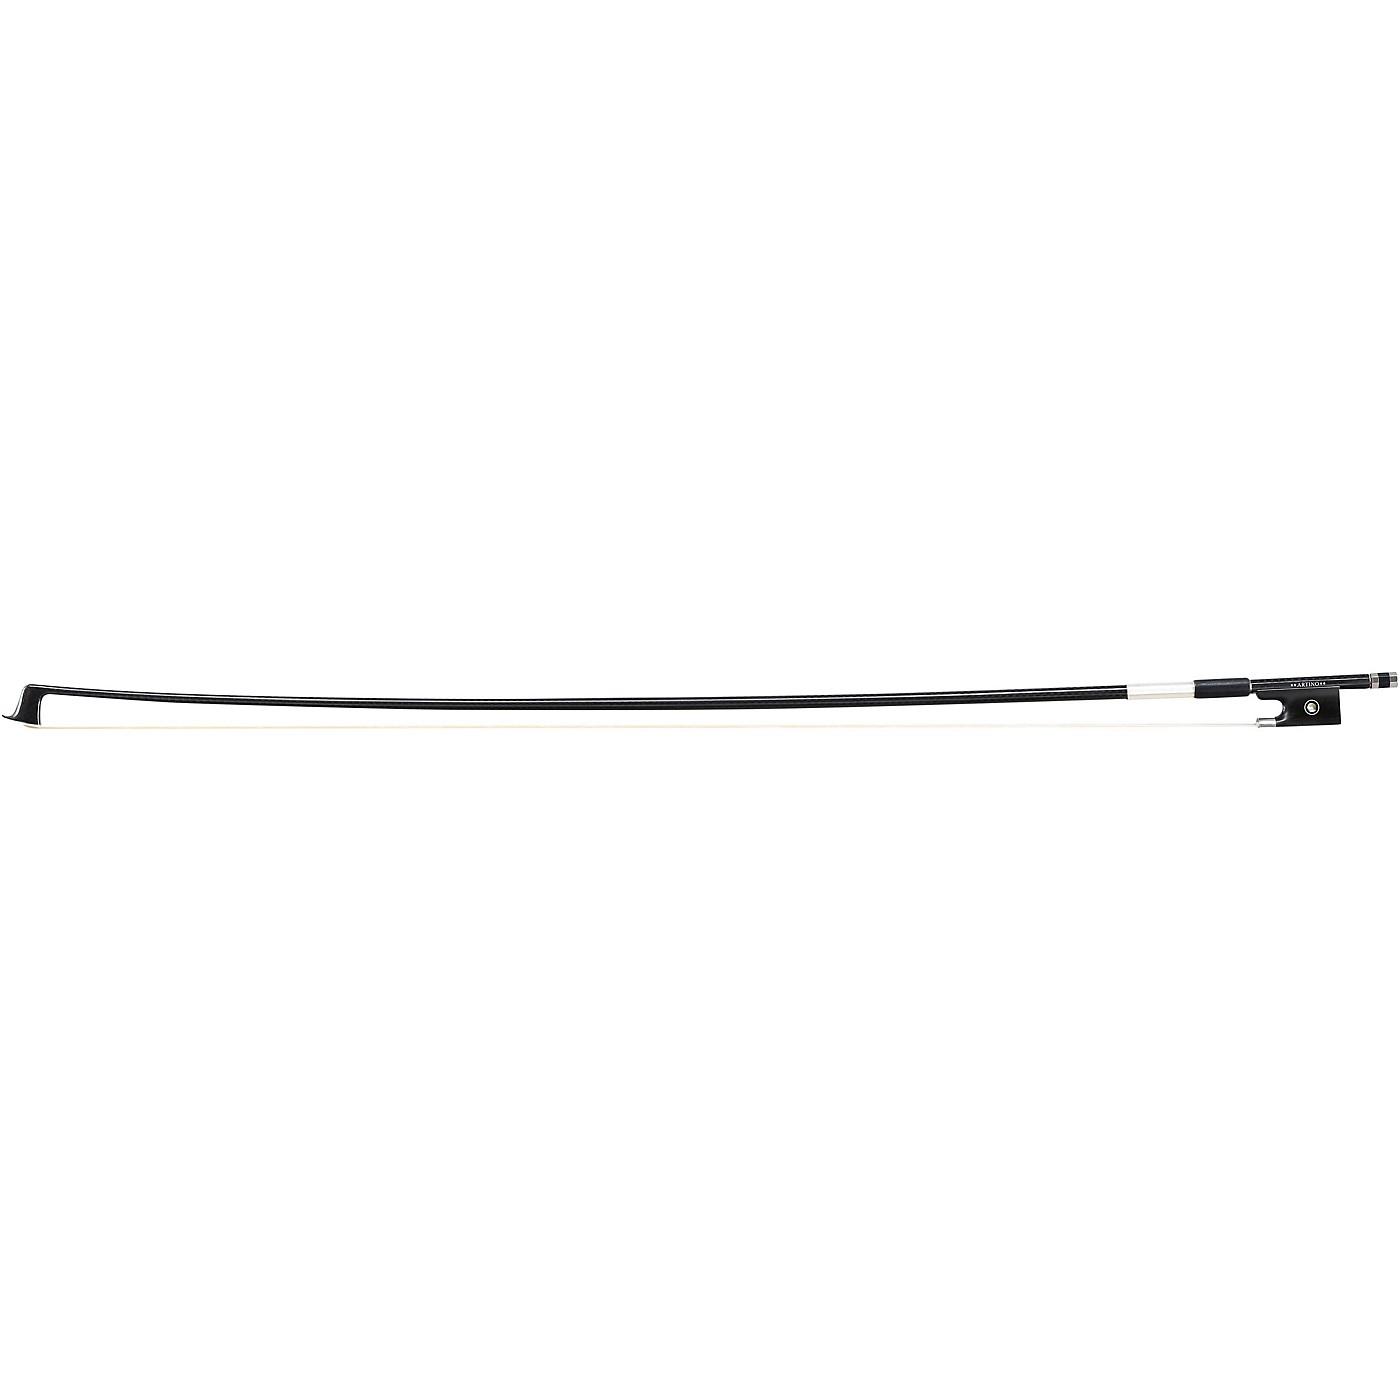 Artino Two Star Woven Carbon Fiber Violin Bow thumbnail